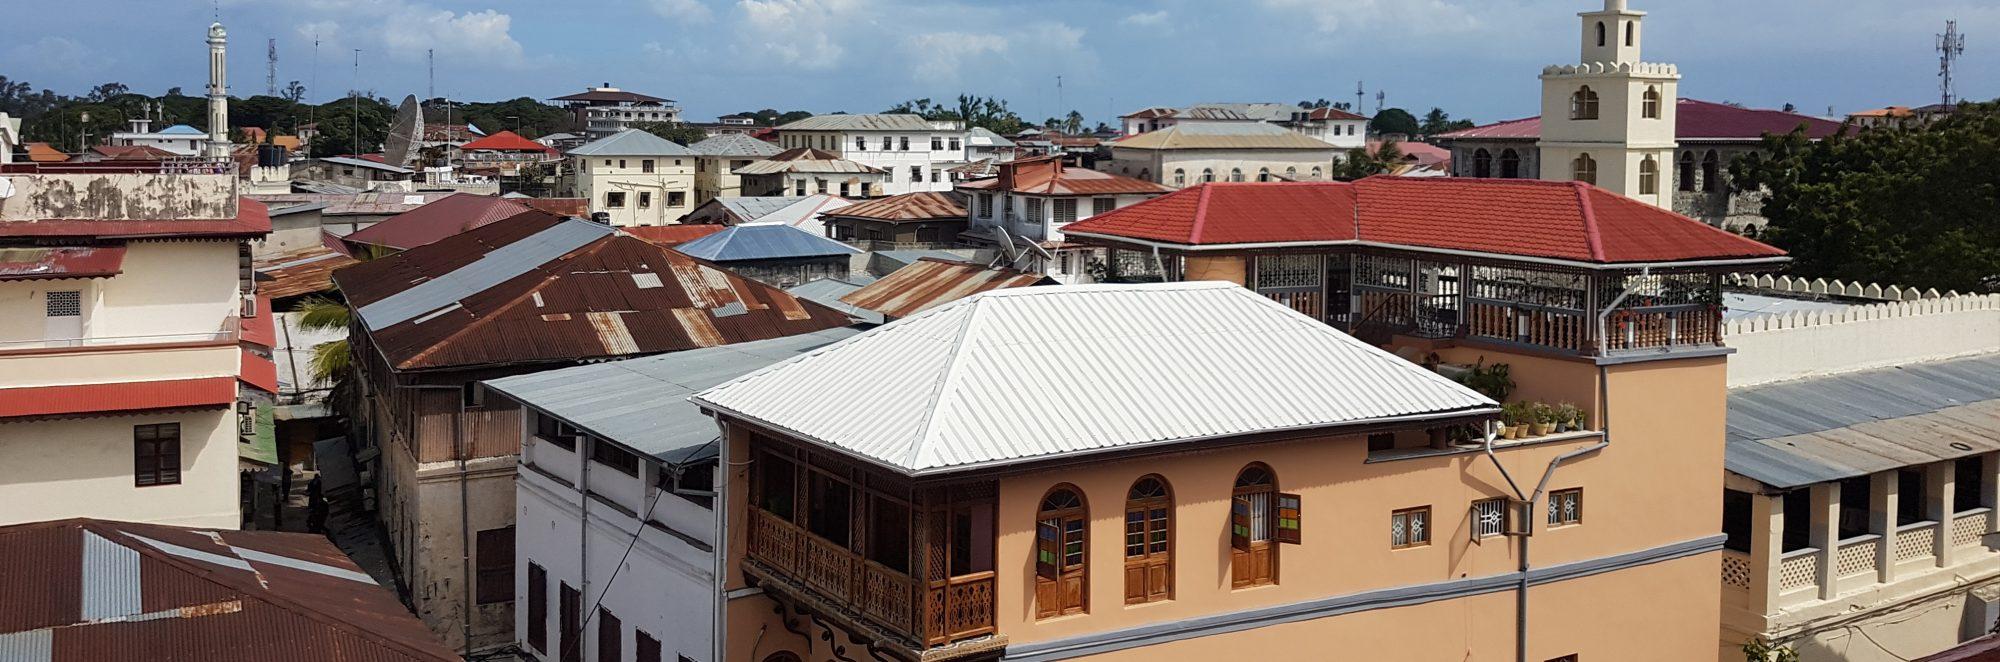 Freundeskreis Potsdam – Sansibar